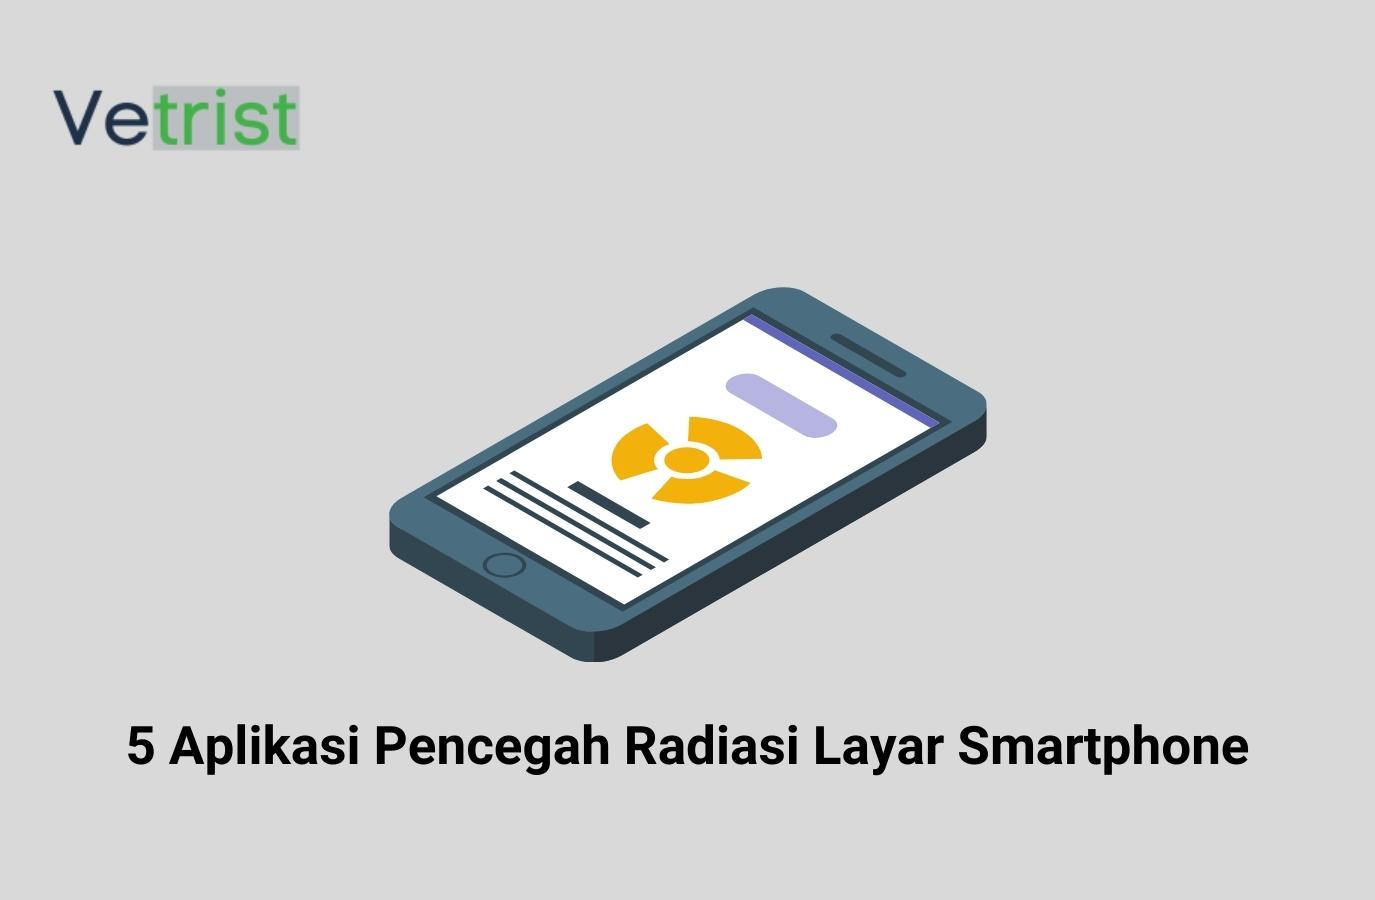 5 Aplikasi Pencegah Radiasi Layar Smartphone